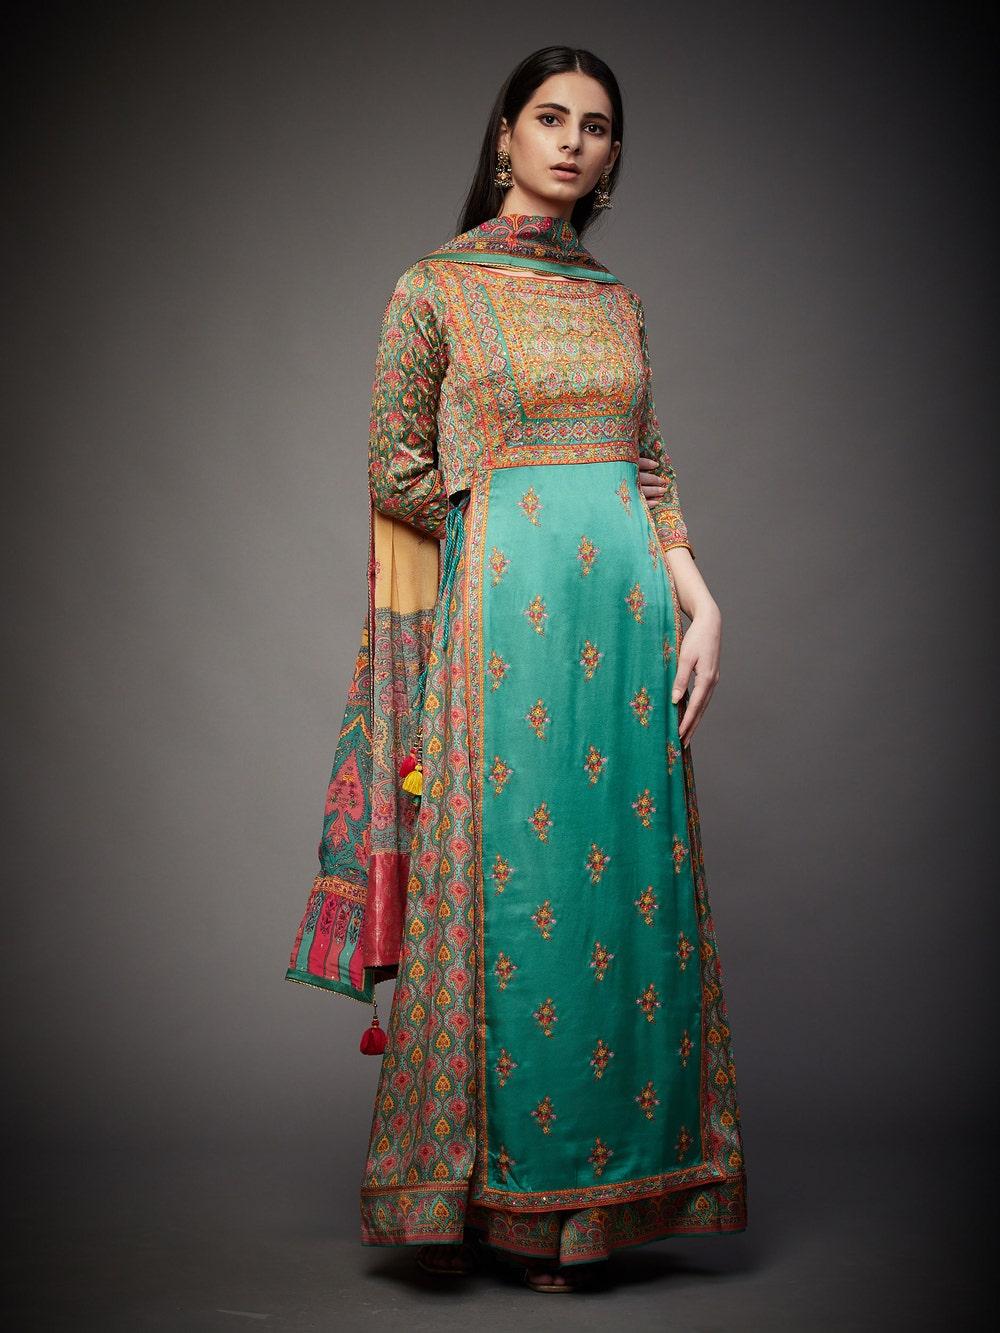 Jade & Multi Colored Anantnag Zardozi Hand Embroidered Suit Set